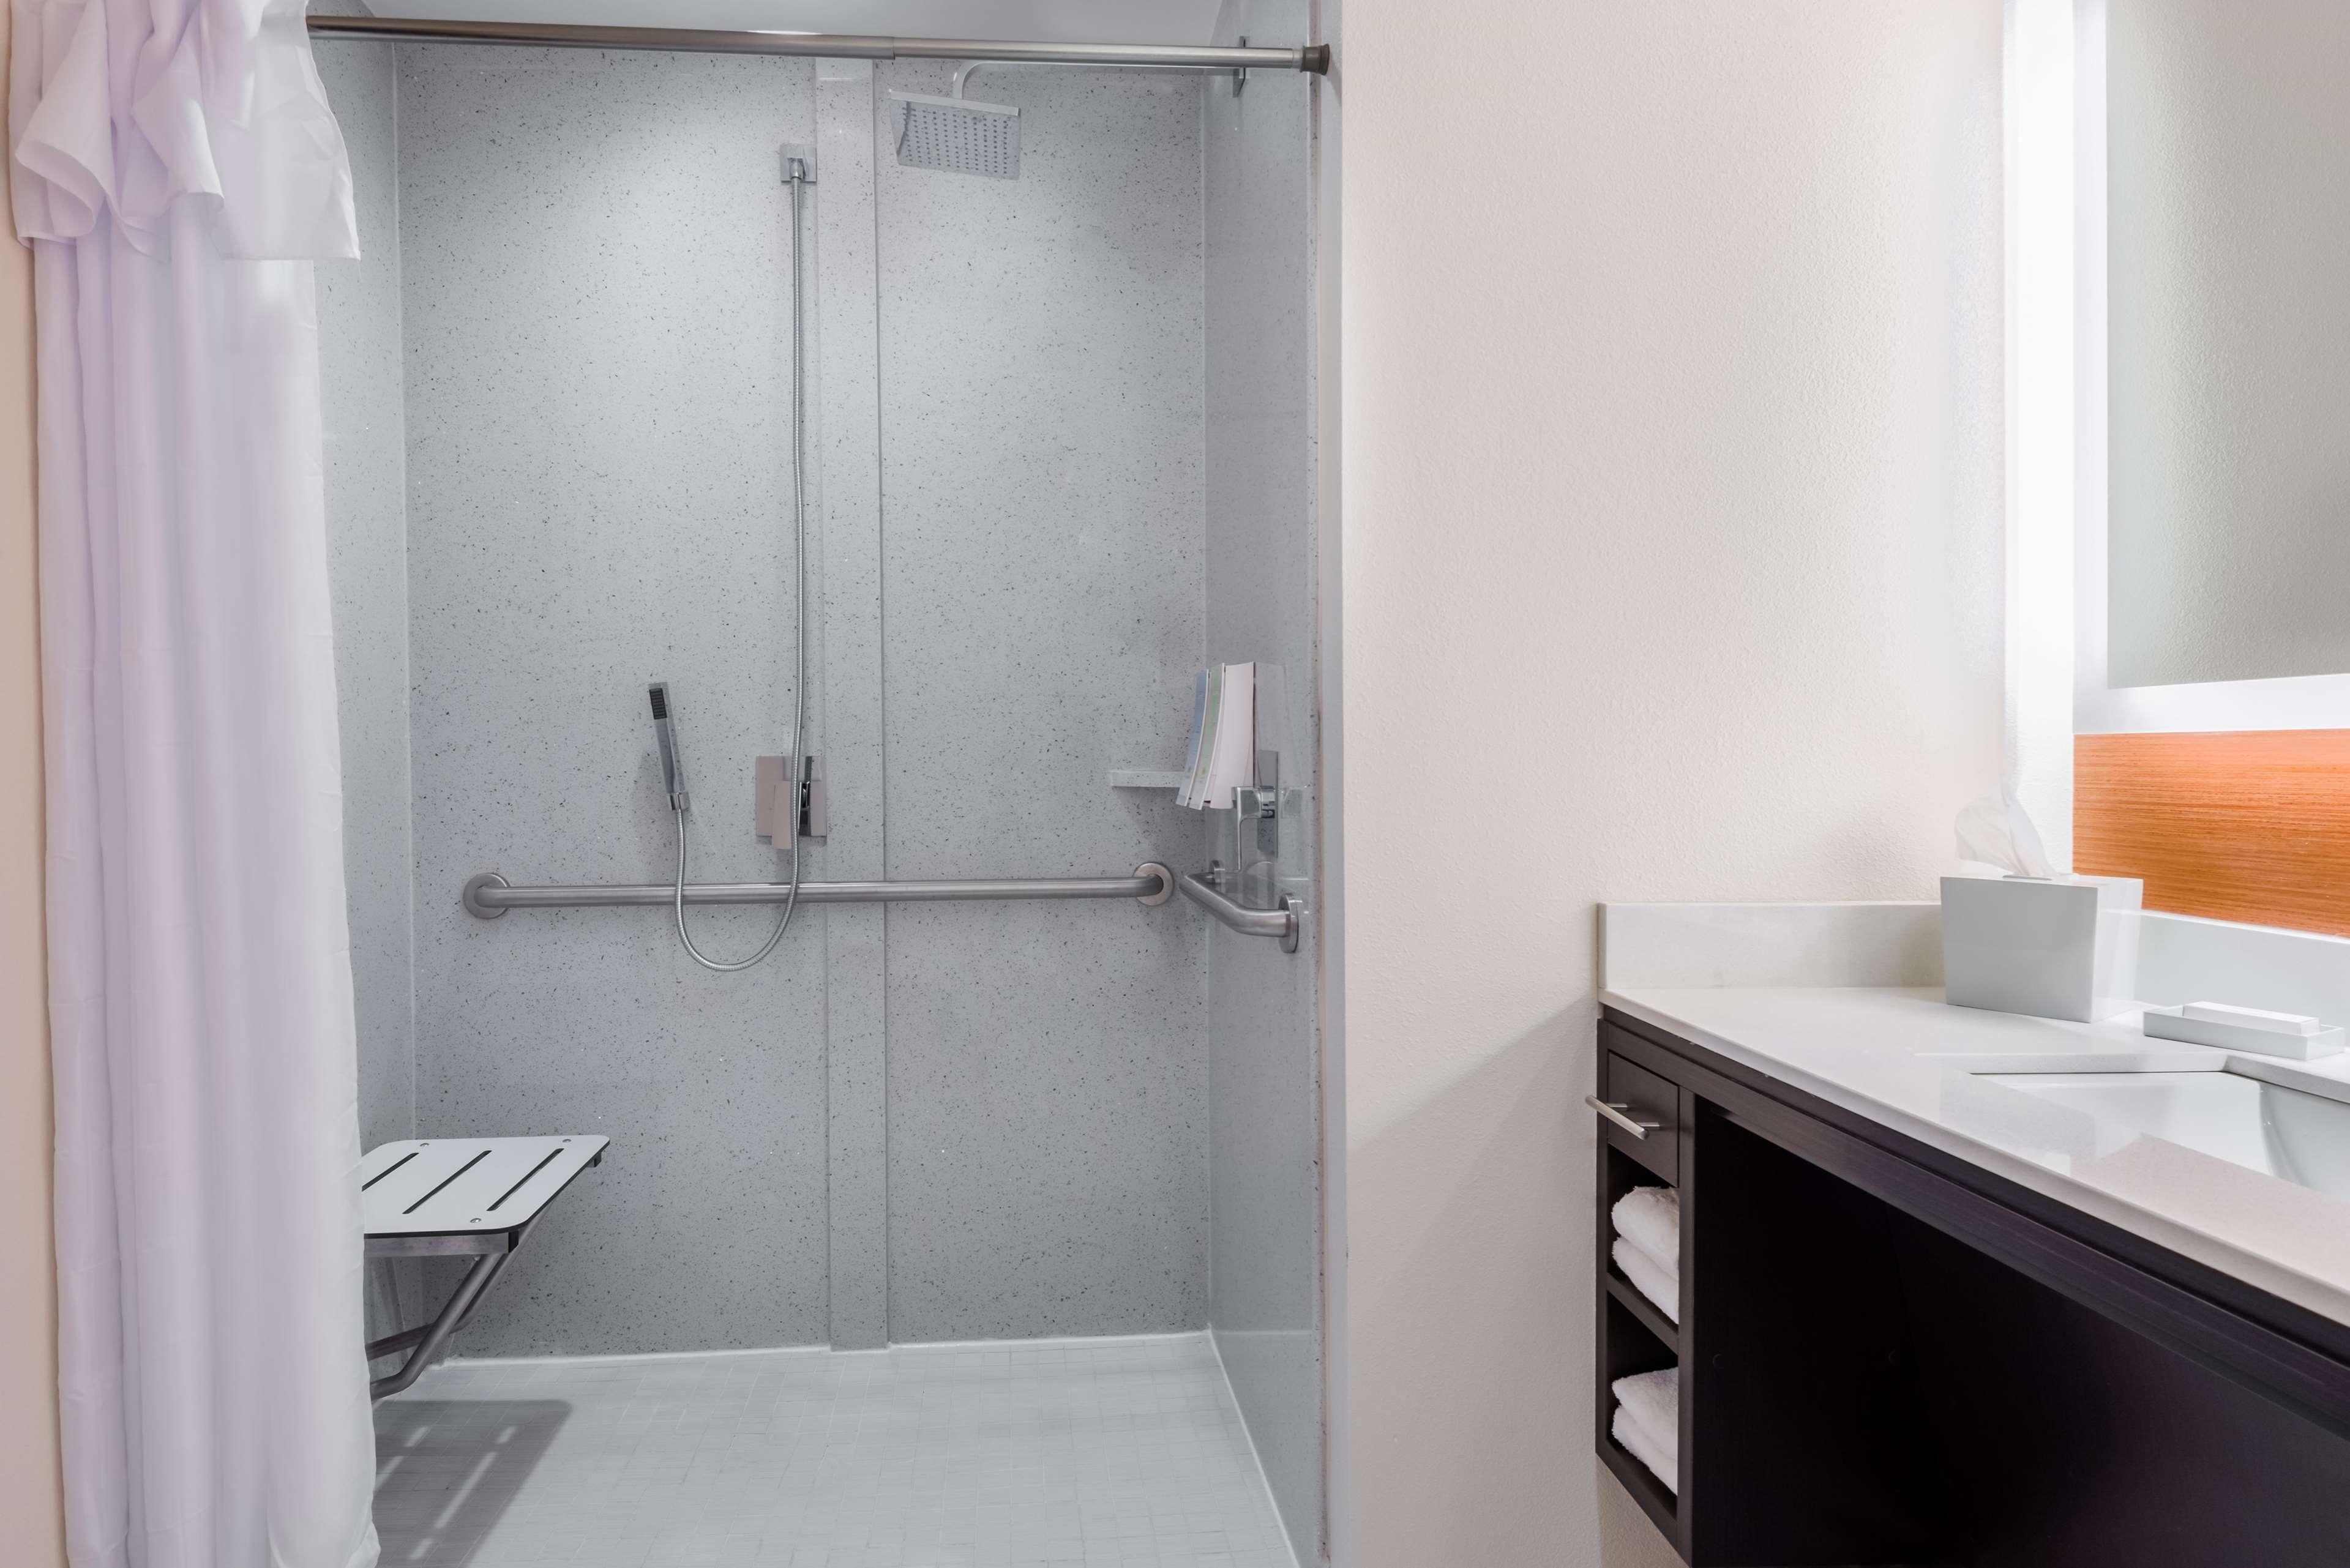 Home2 Suites by Hilton Atlanta Downtown image 14